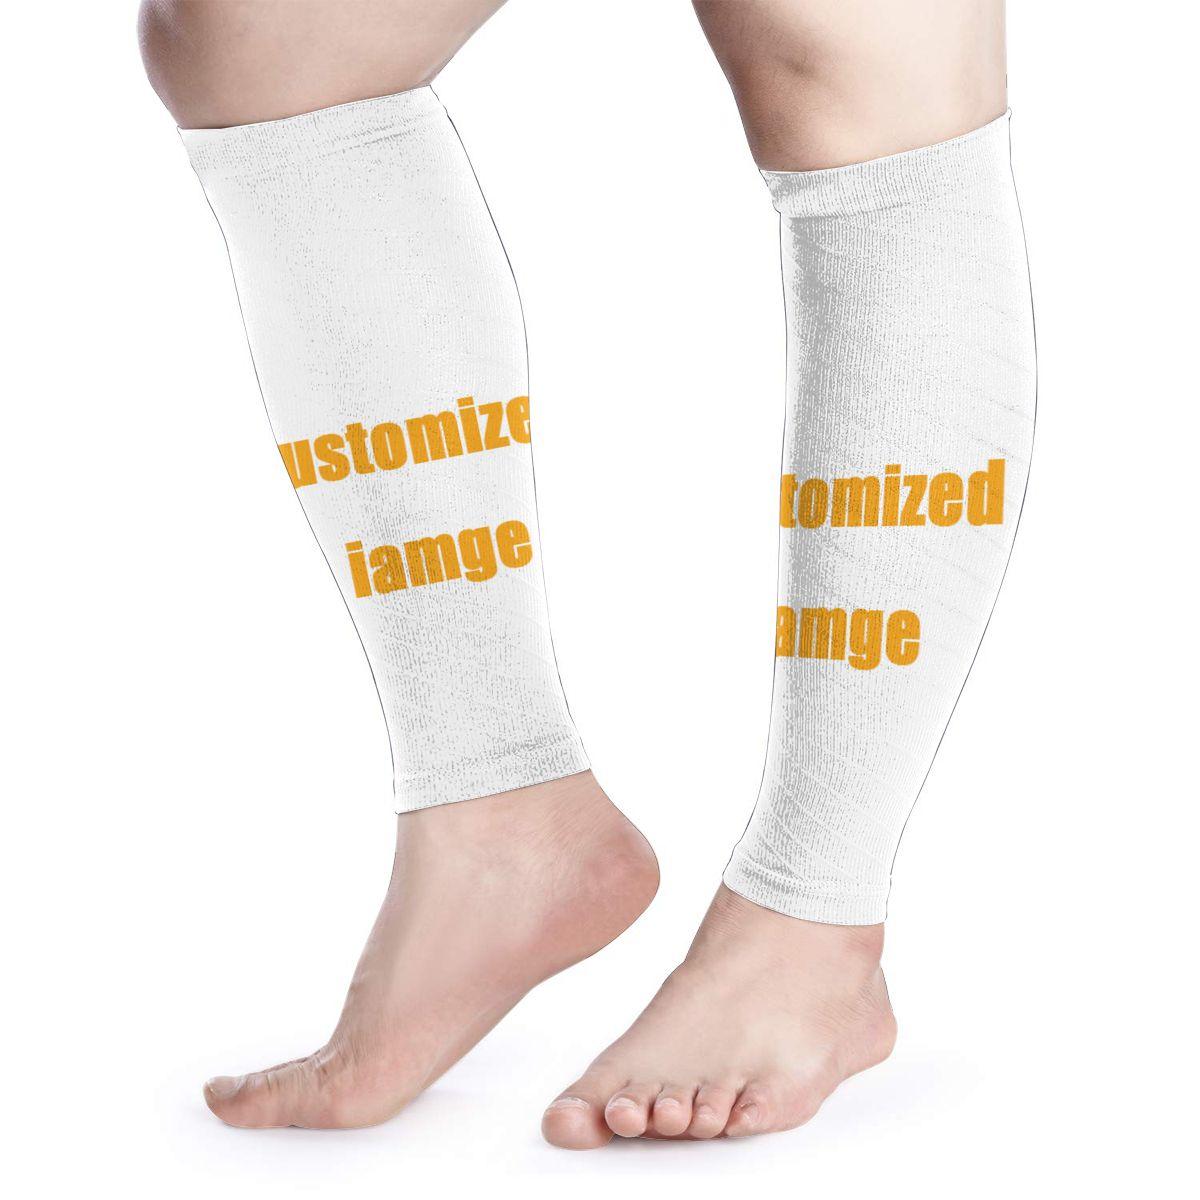 NOISYDESIGNS Custom Sports Calf Support Cycling Leg Warmers Compression Shin Wrap Guard Running Leg Sleeve Legging Calf Sleeves